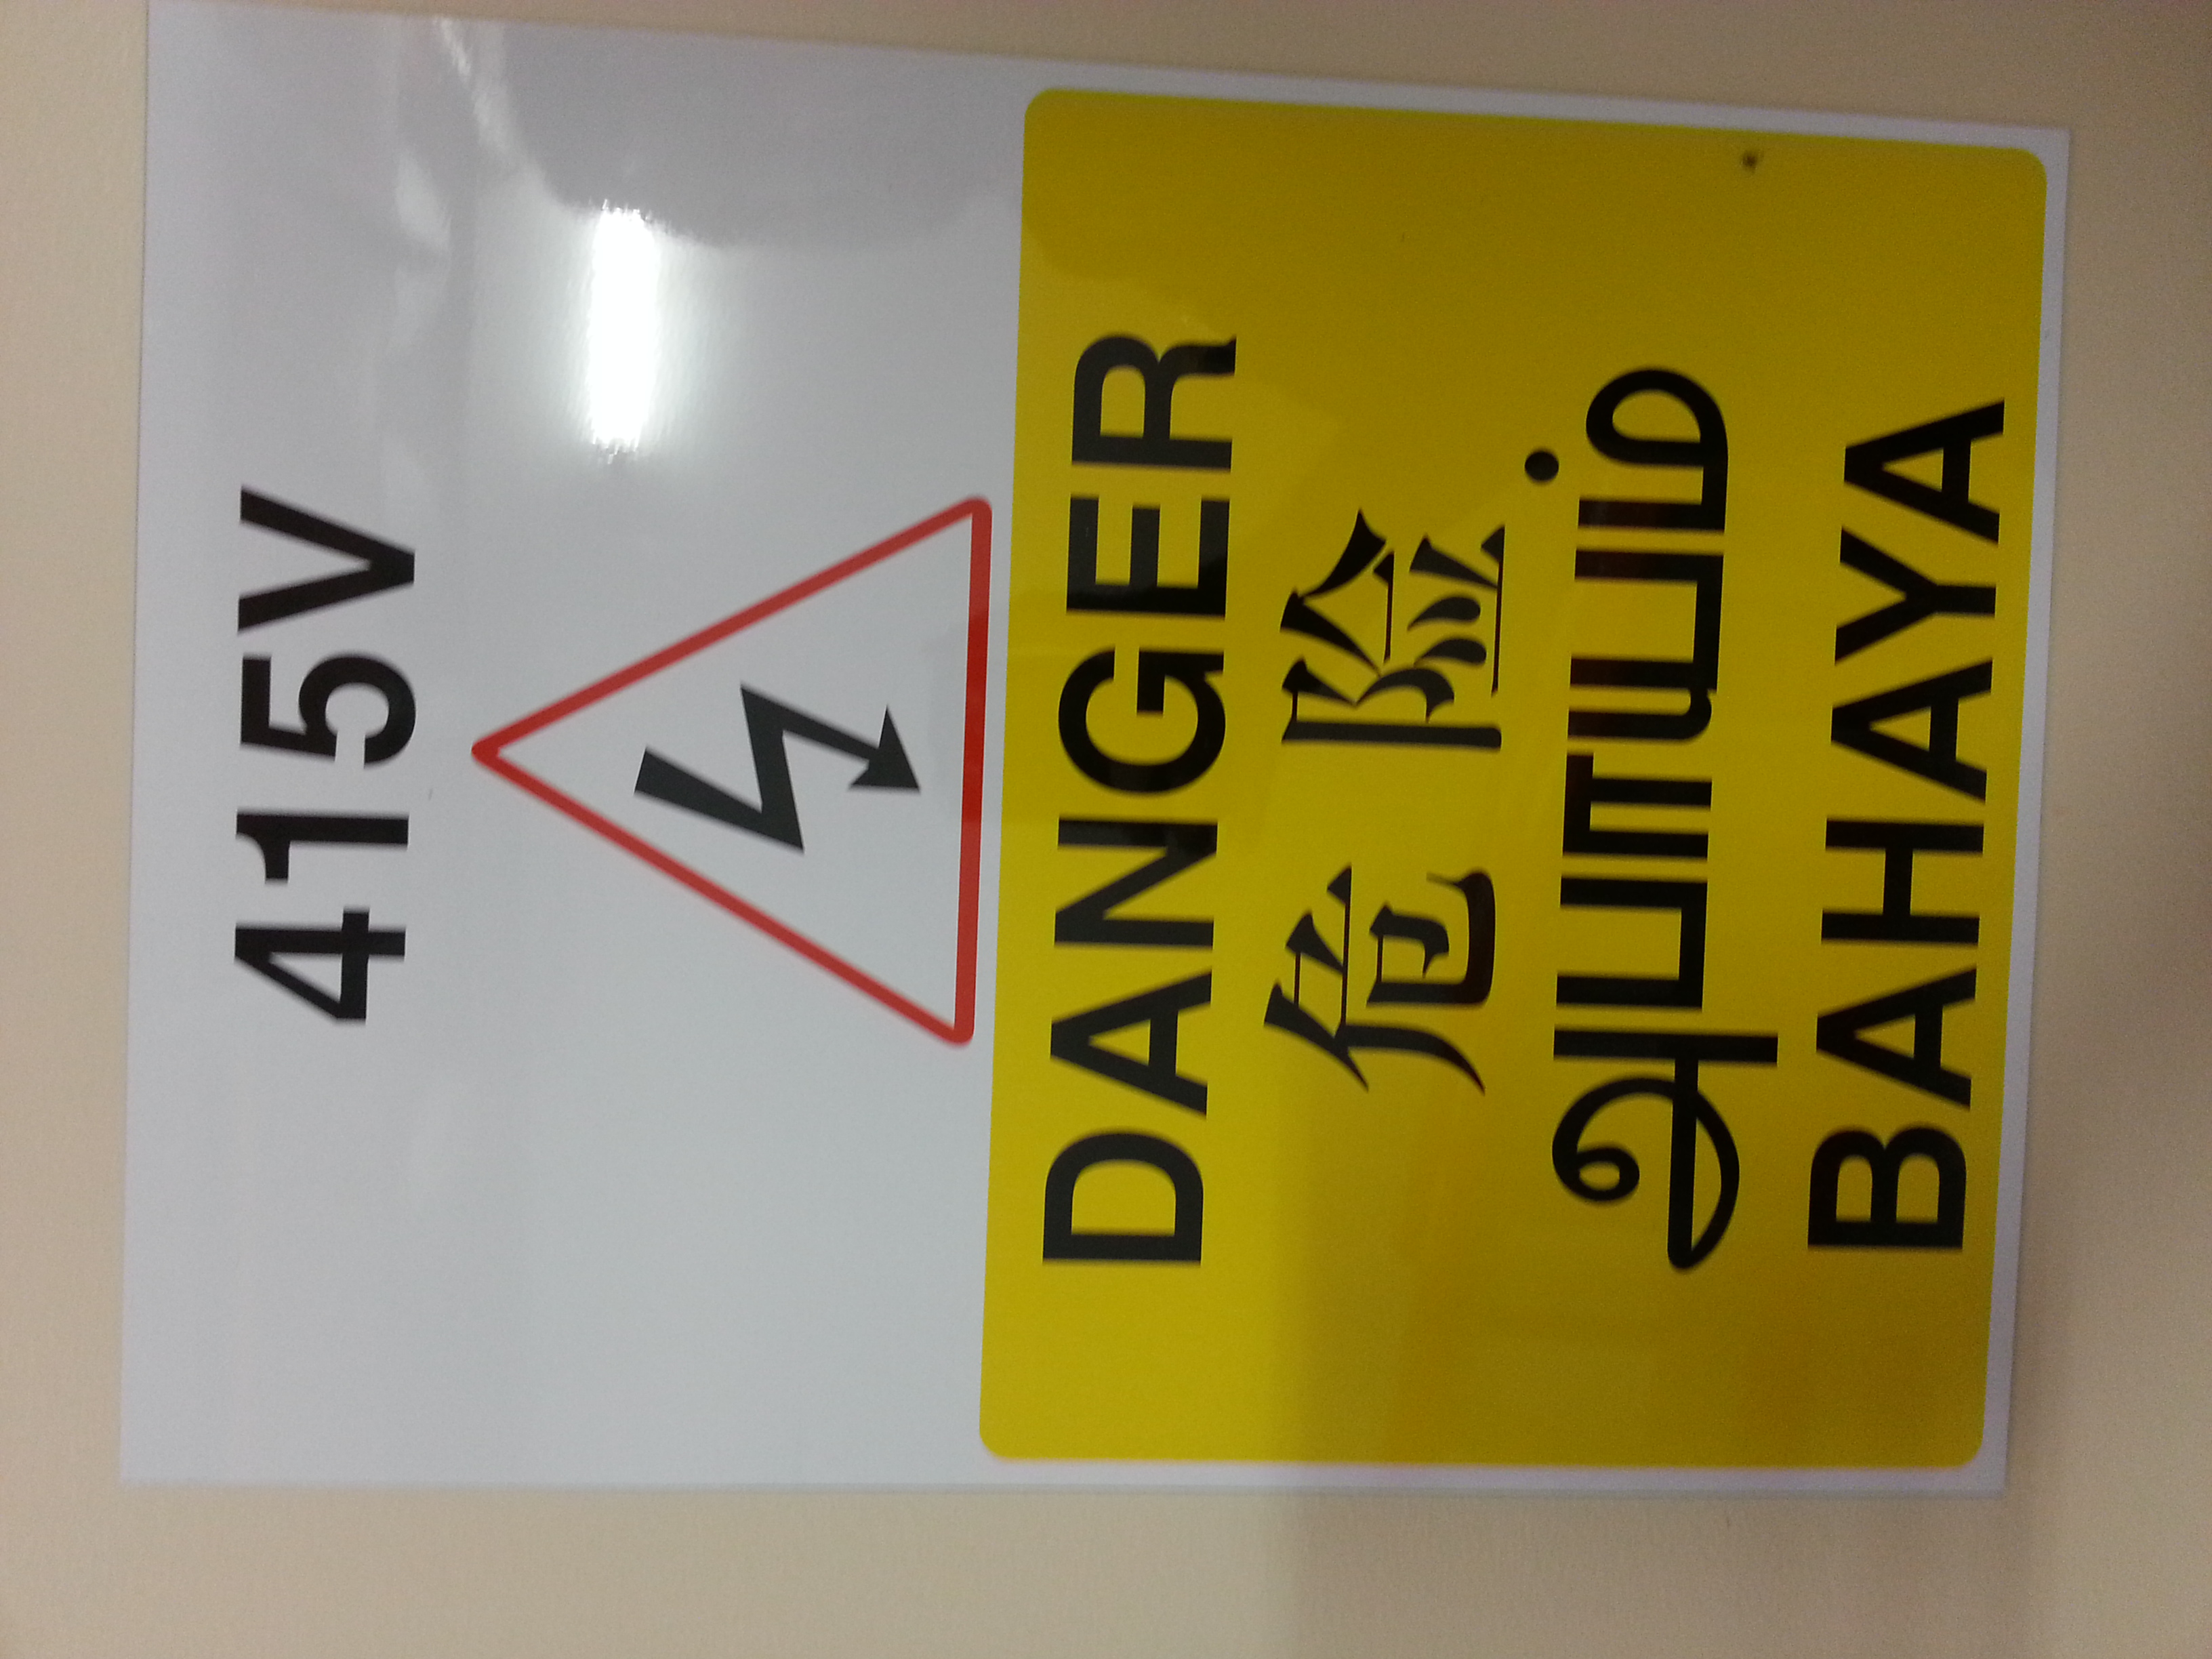 File:Electrical 'Danger sign board' jpg - Wikimedia Commons